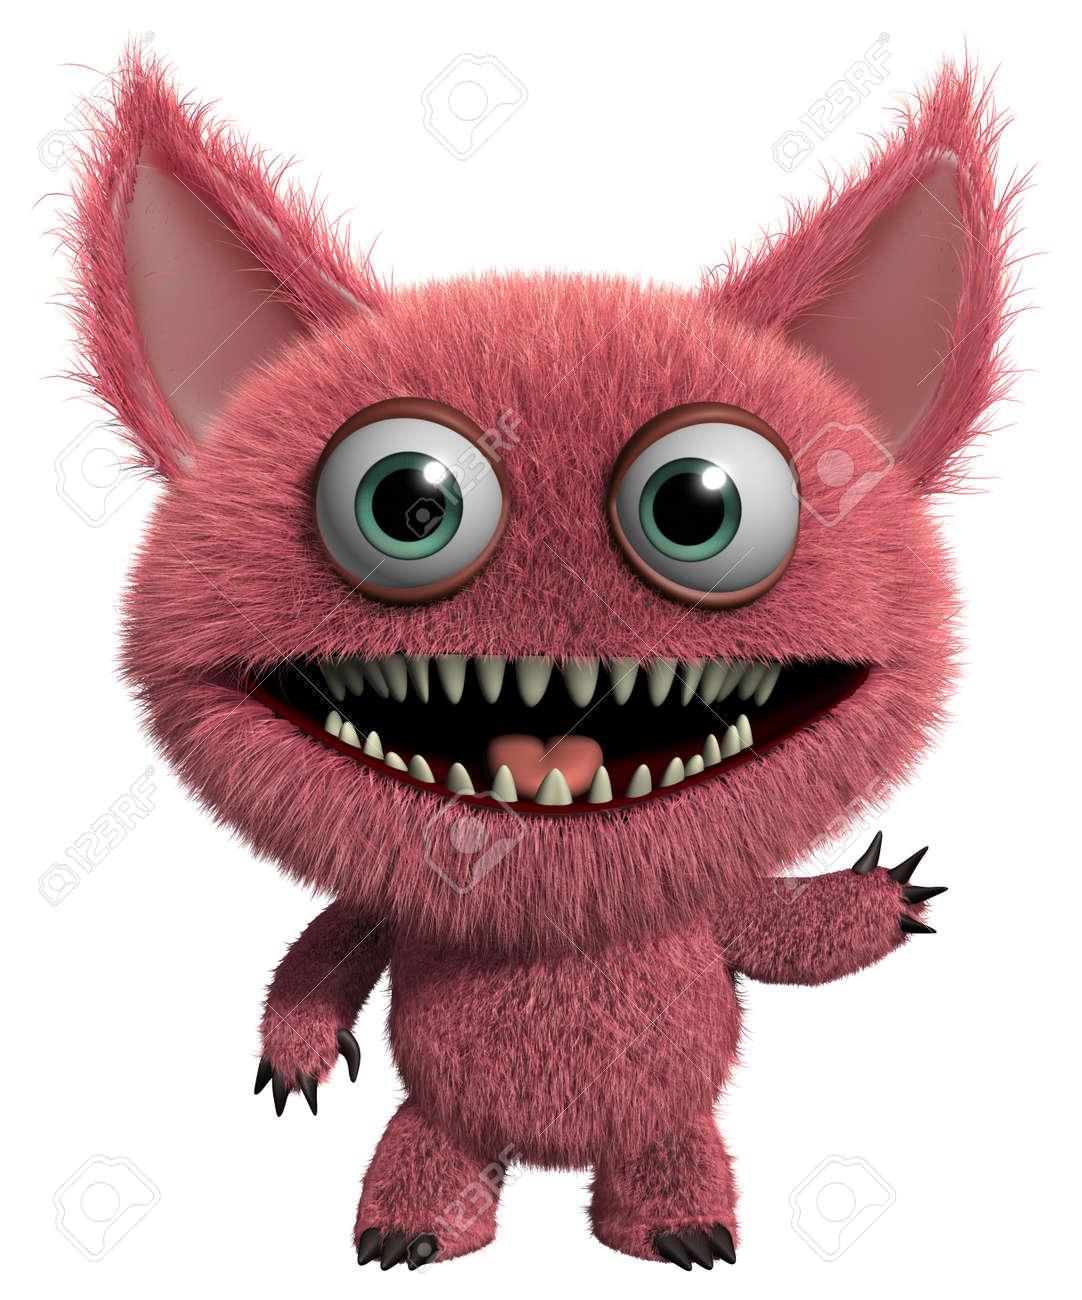 3d cartoon cute furry gremlin monster Stock Photo - 15743576